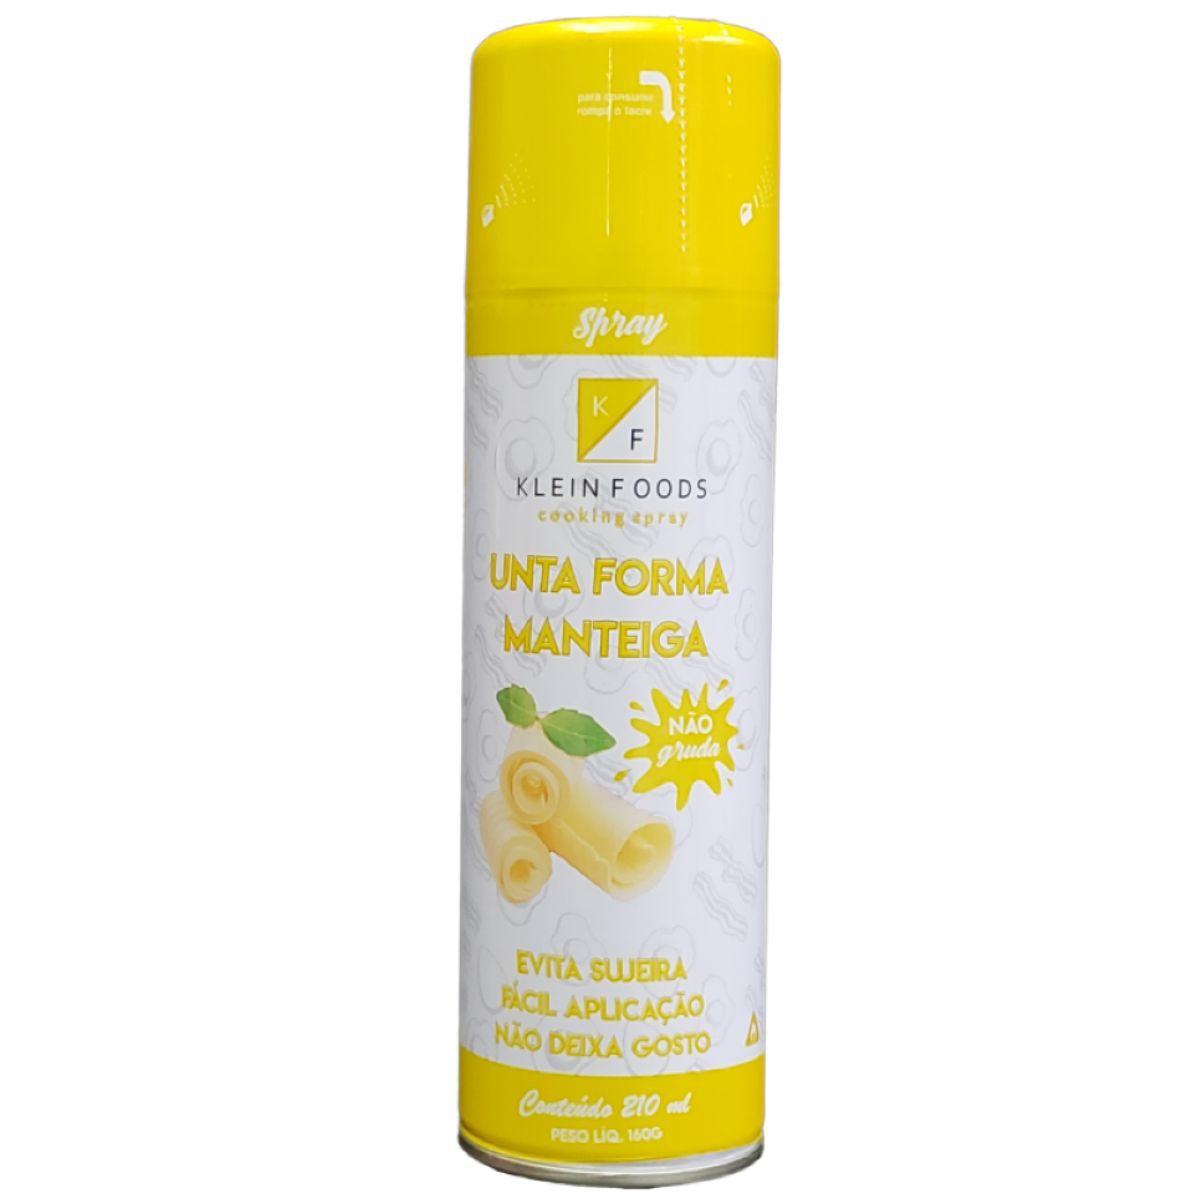 Desmoldante Unta Forma Manteiga 210ml Klein Foods